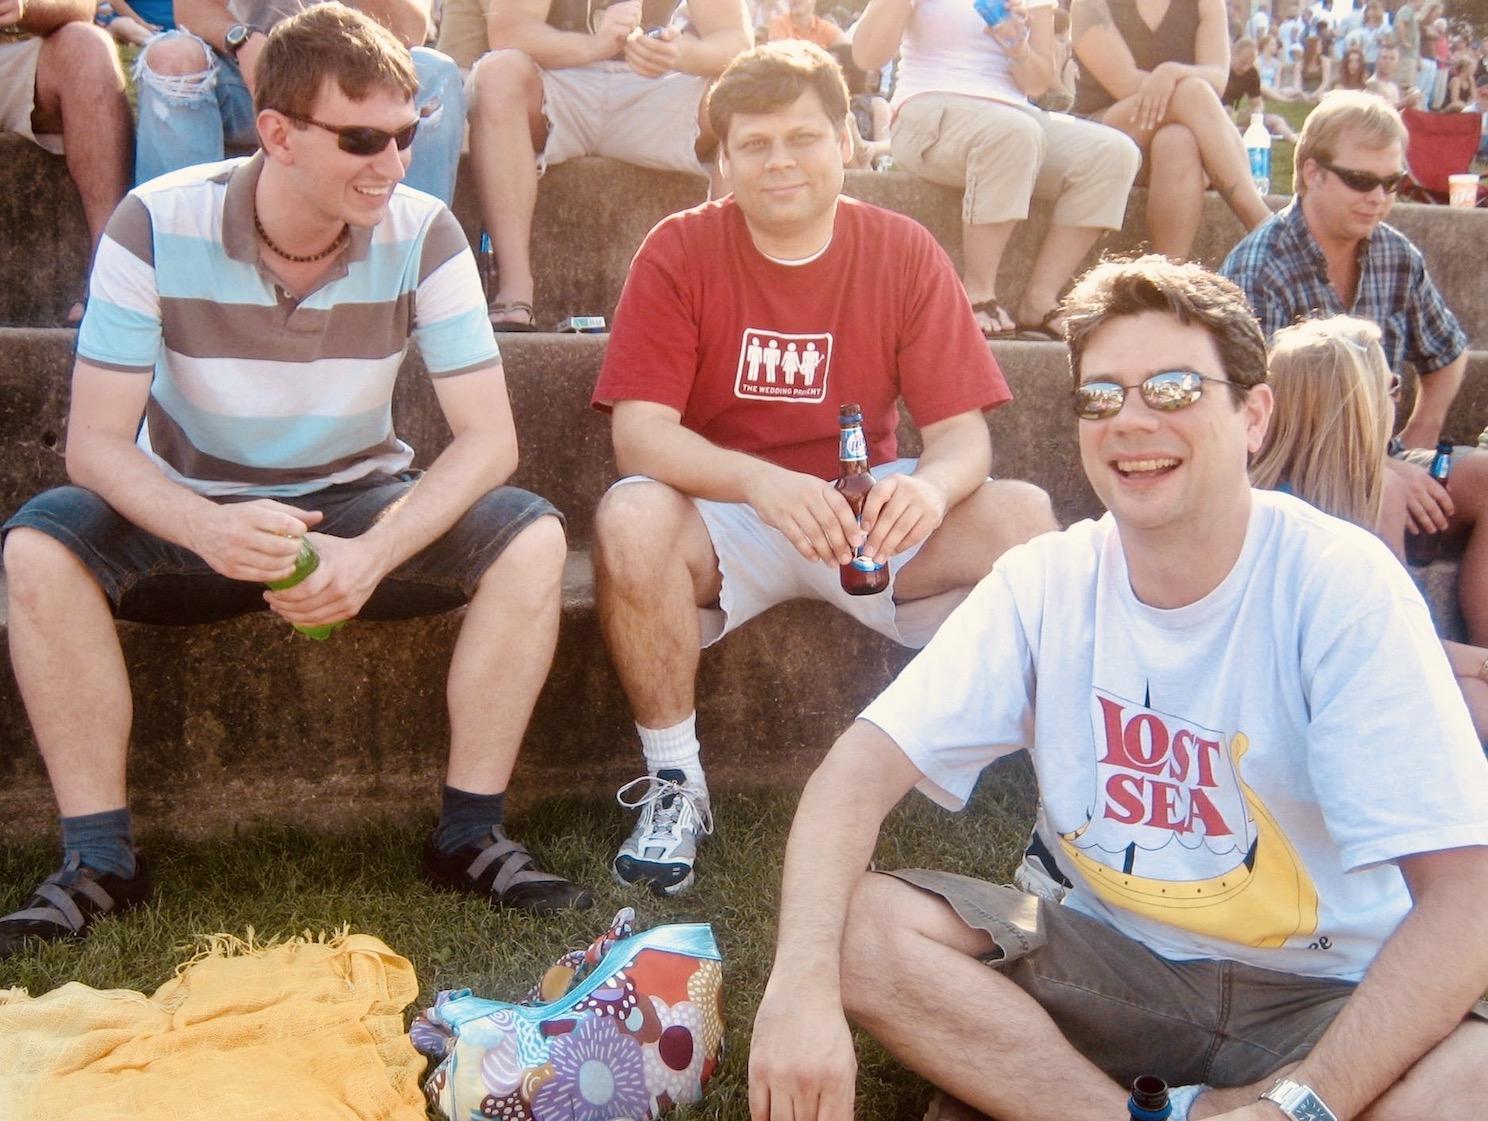 Nashville Nostalgia live music at Riverfront Park